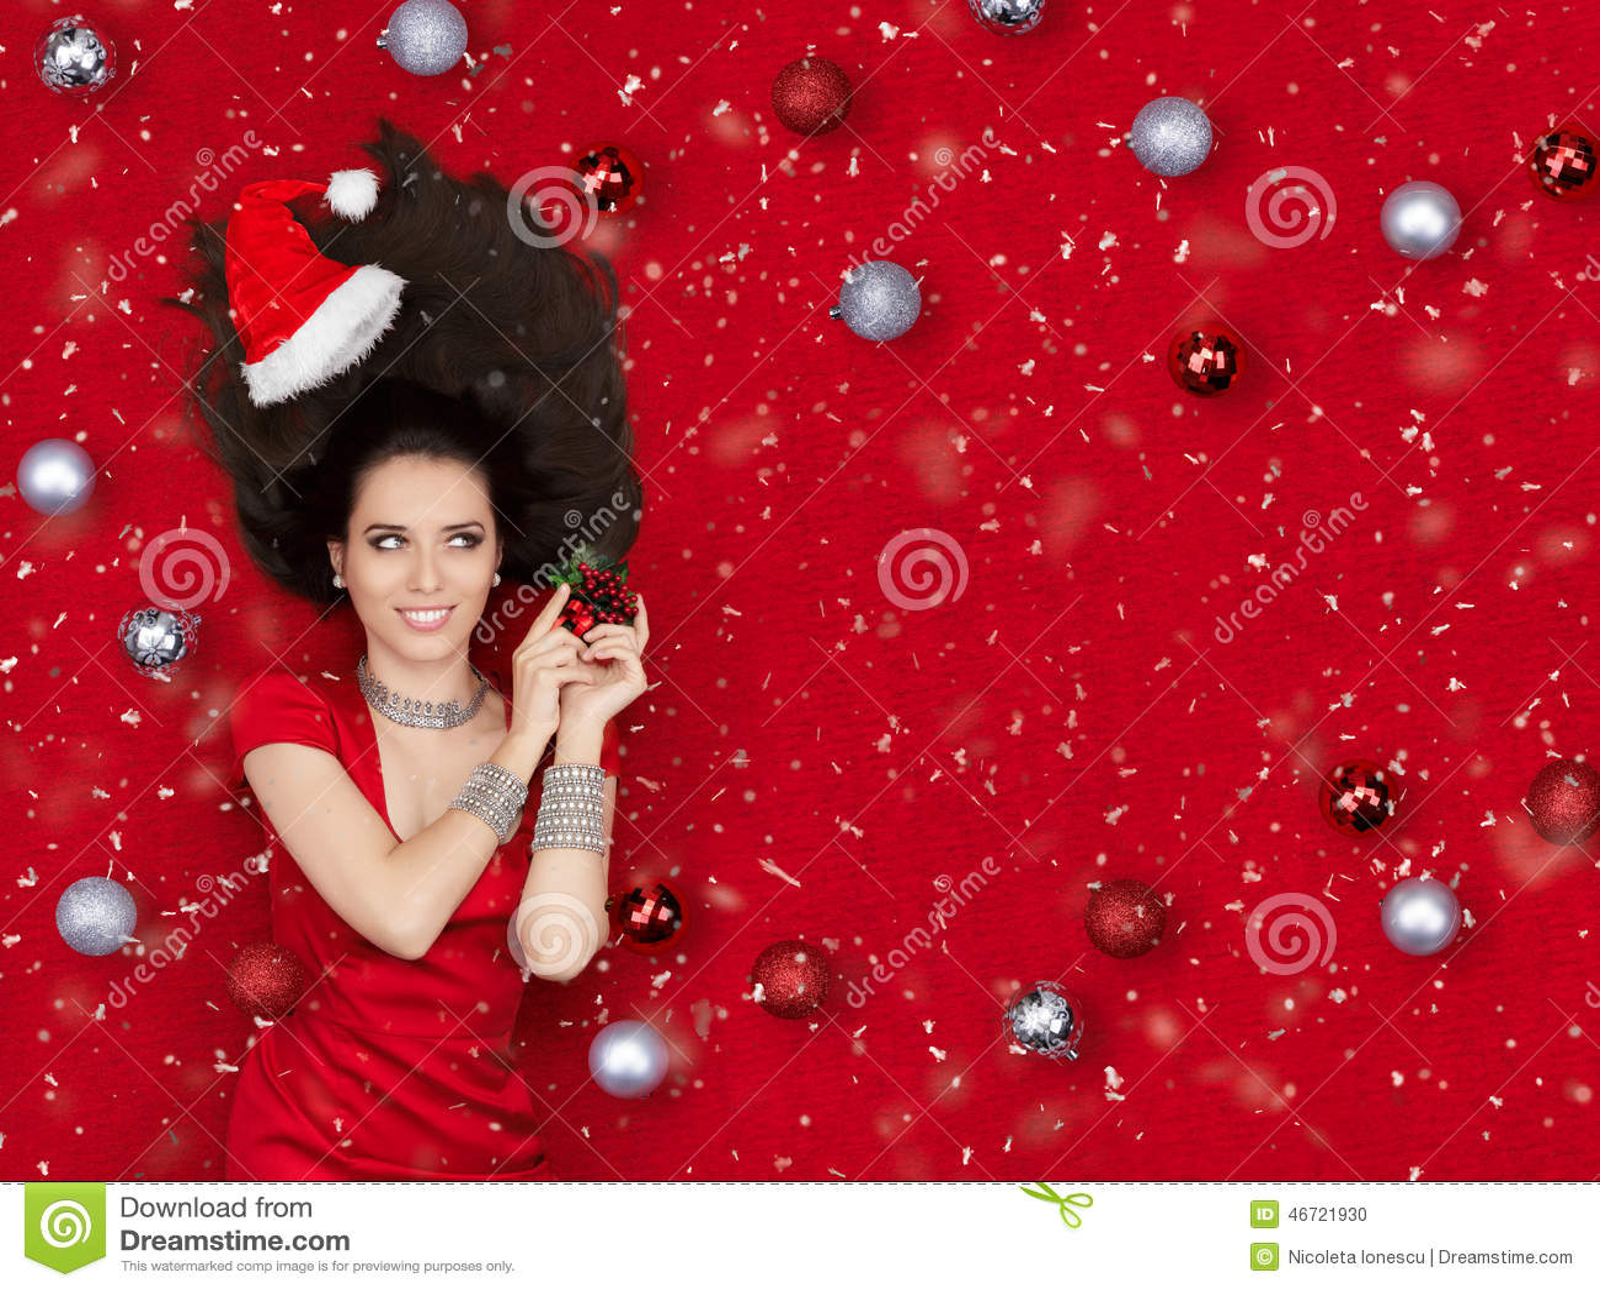 Happy Christmas Girl Holding a Mistletoe